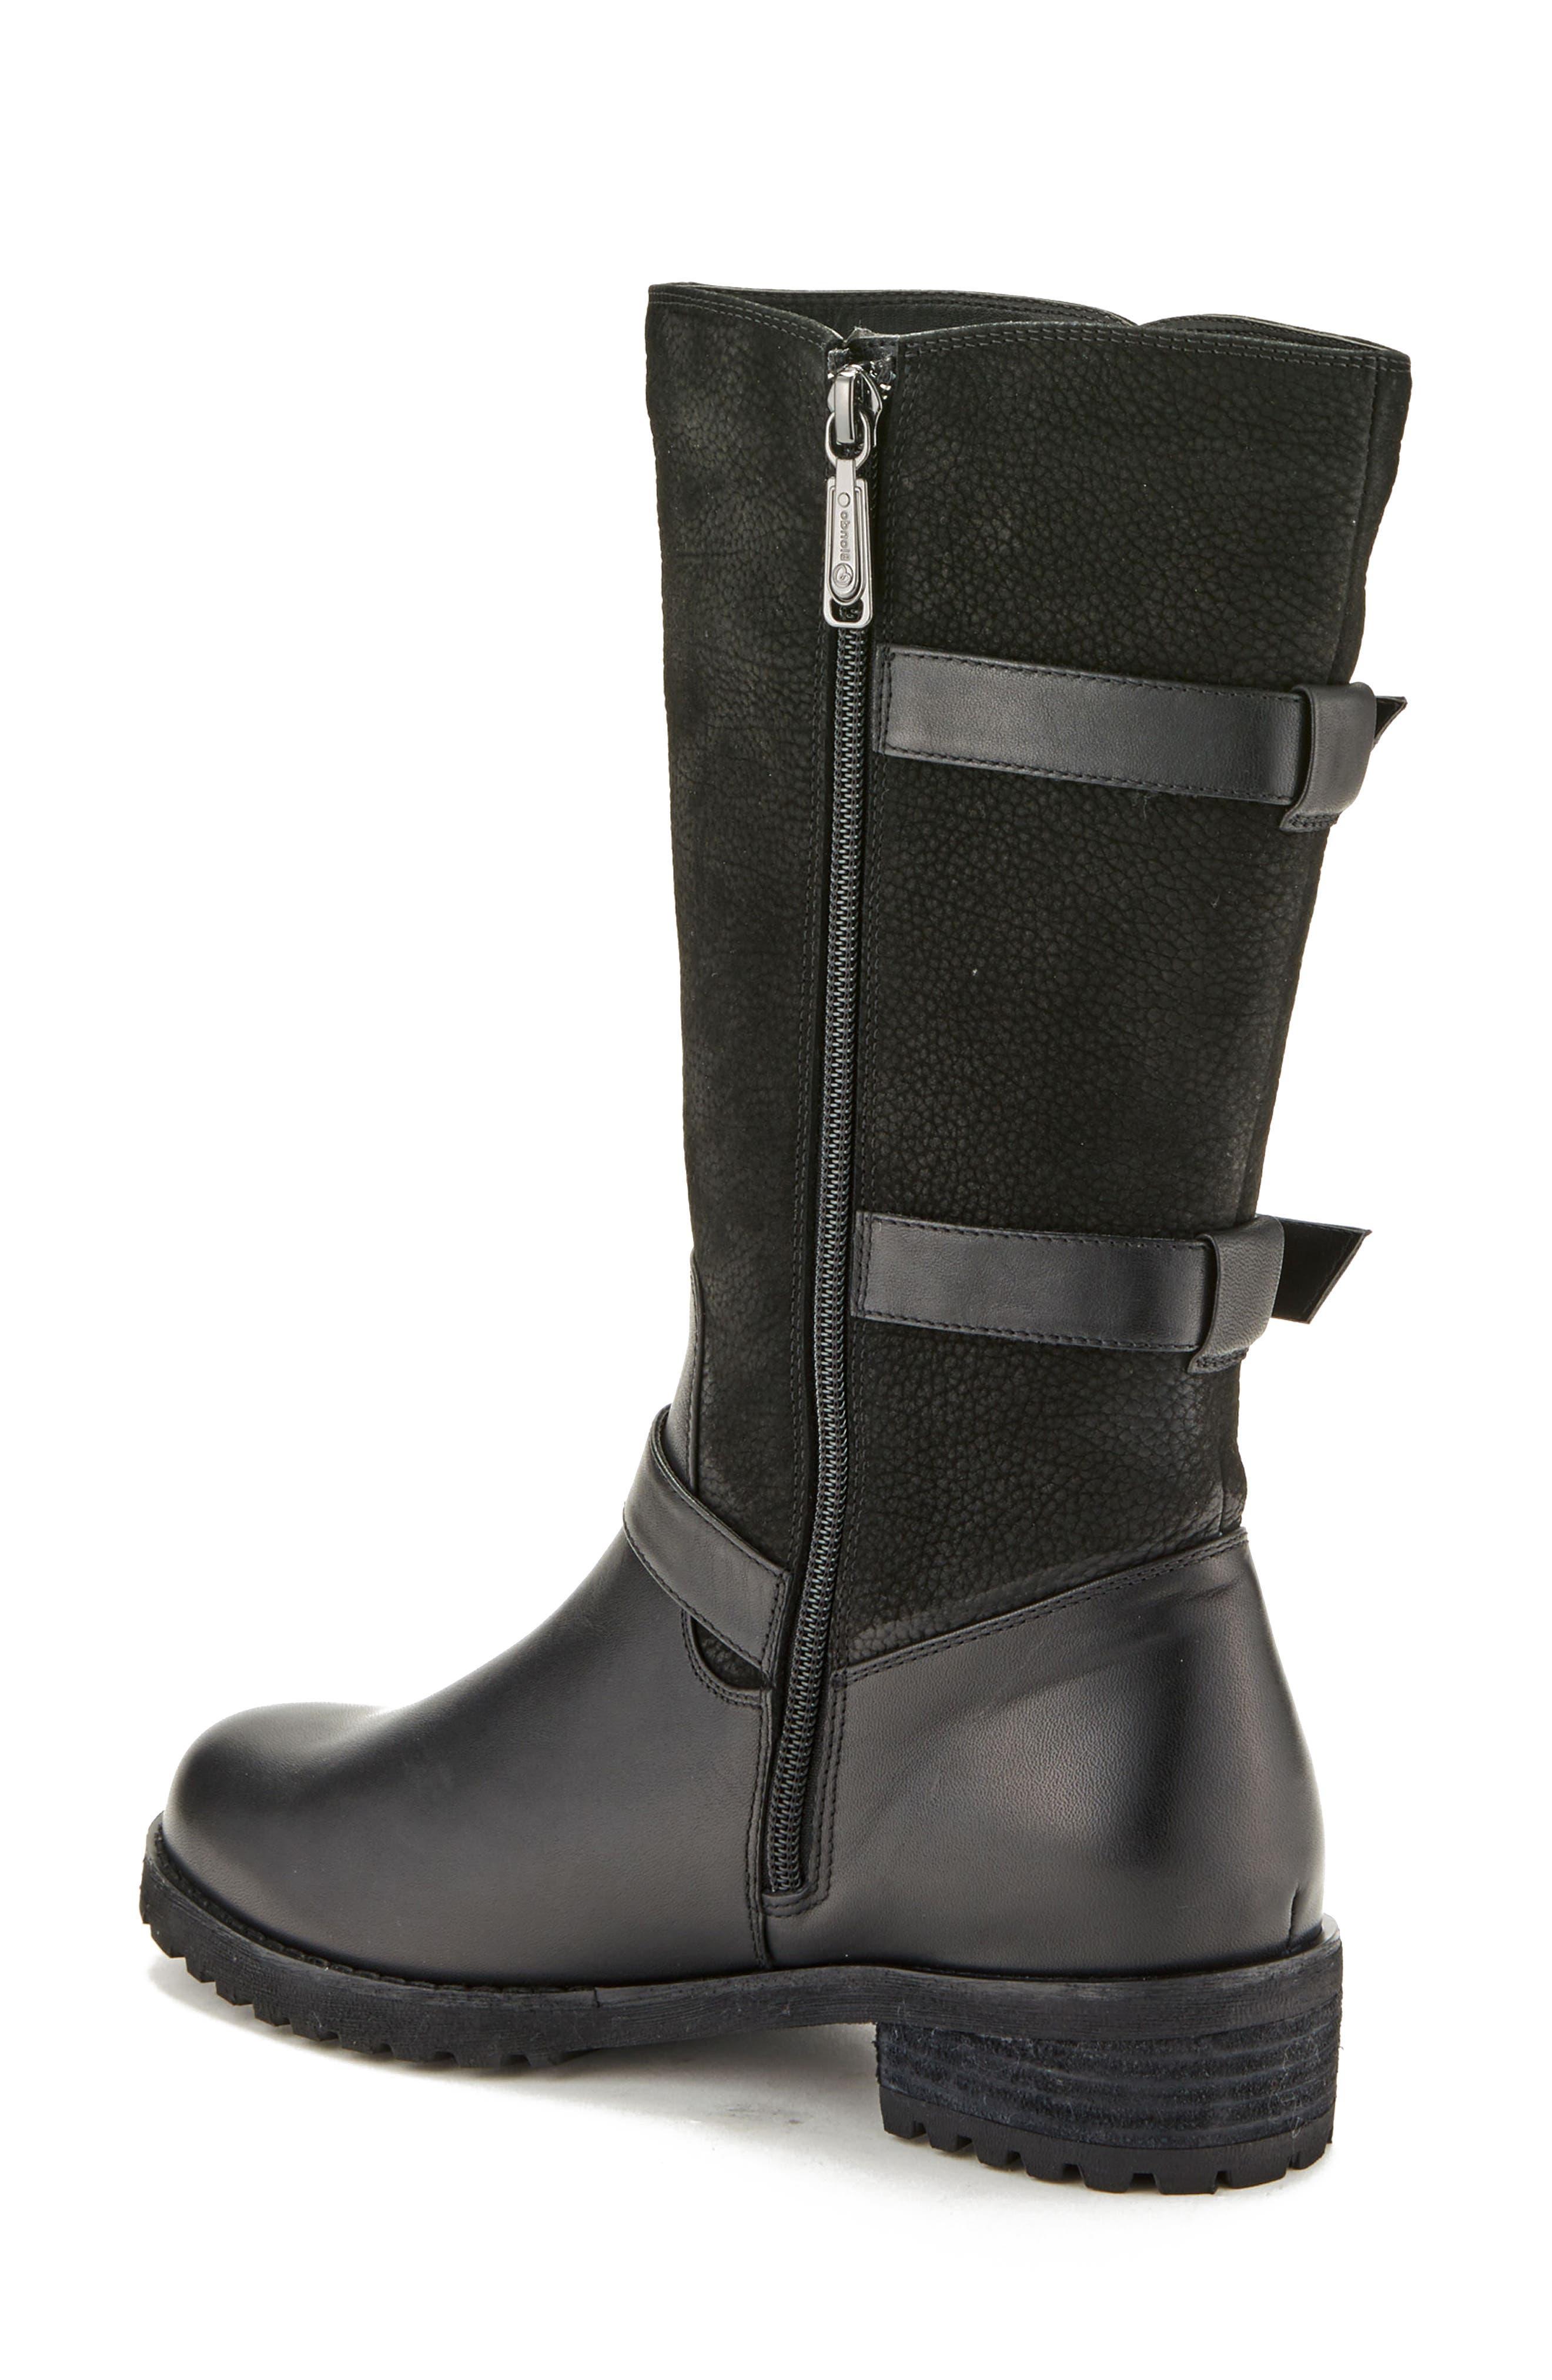 Lenie Waterproof Moto Boot,                             Alternate thumbnail 2, color,                             Black Leather